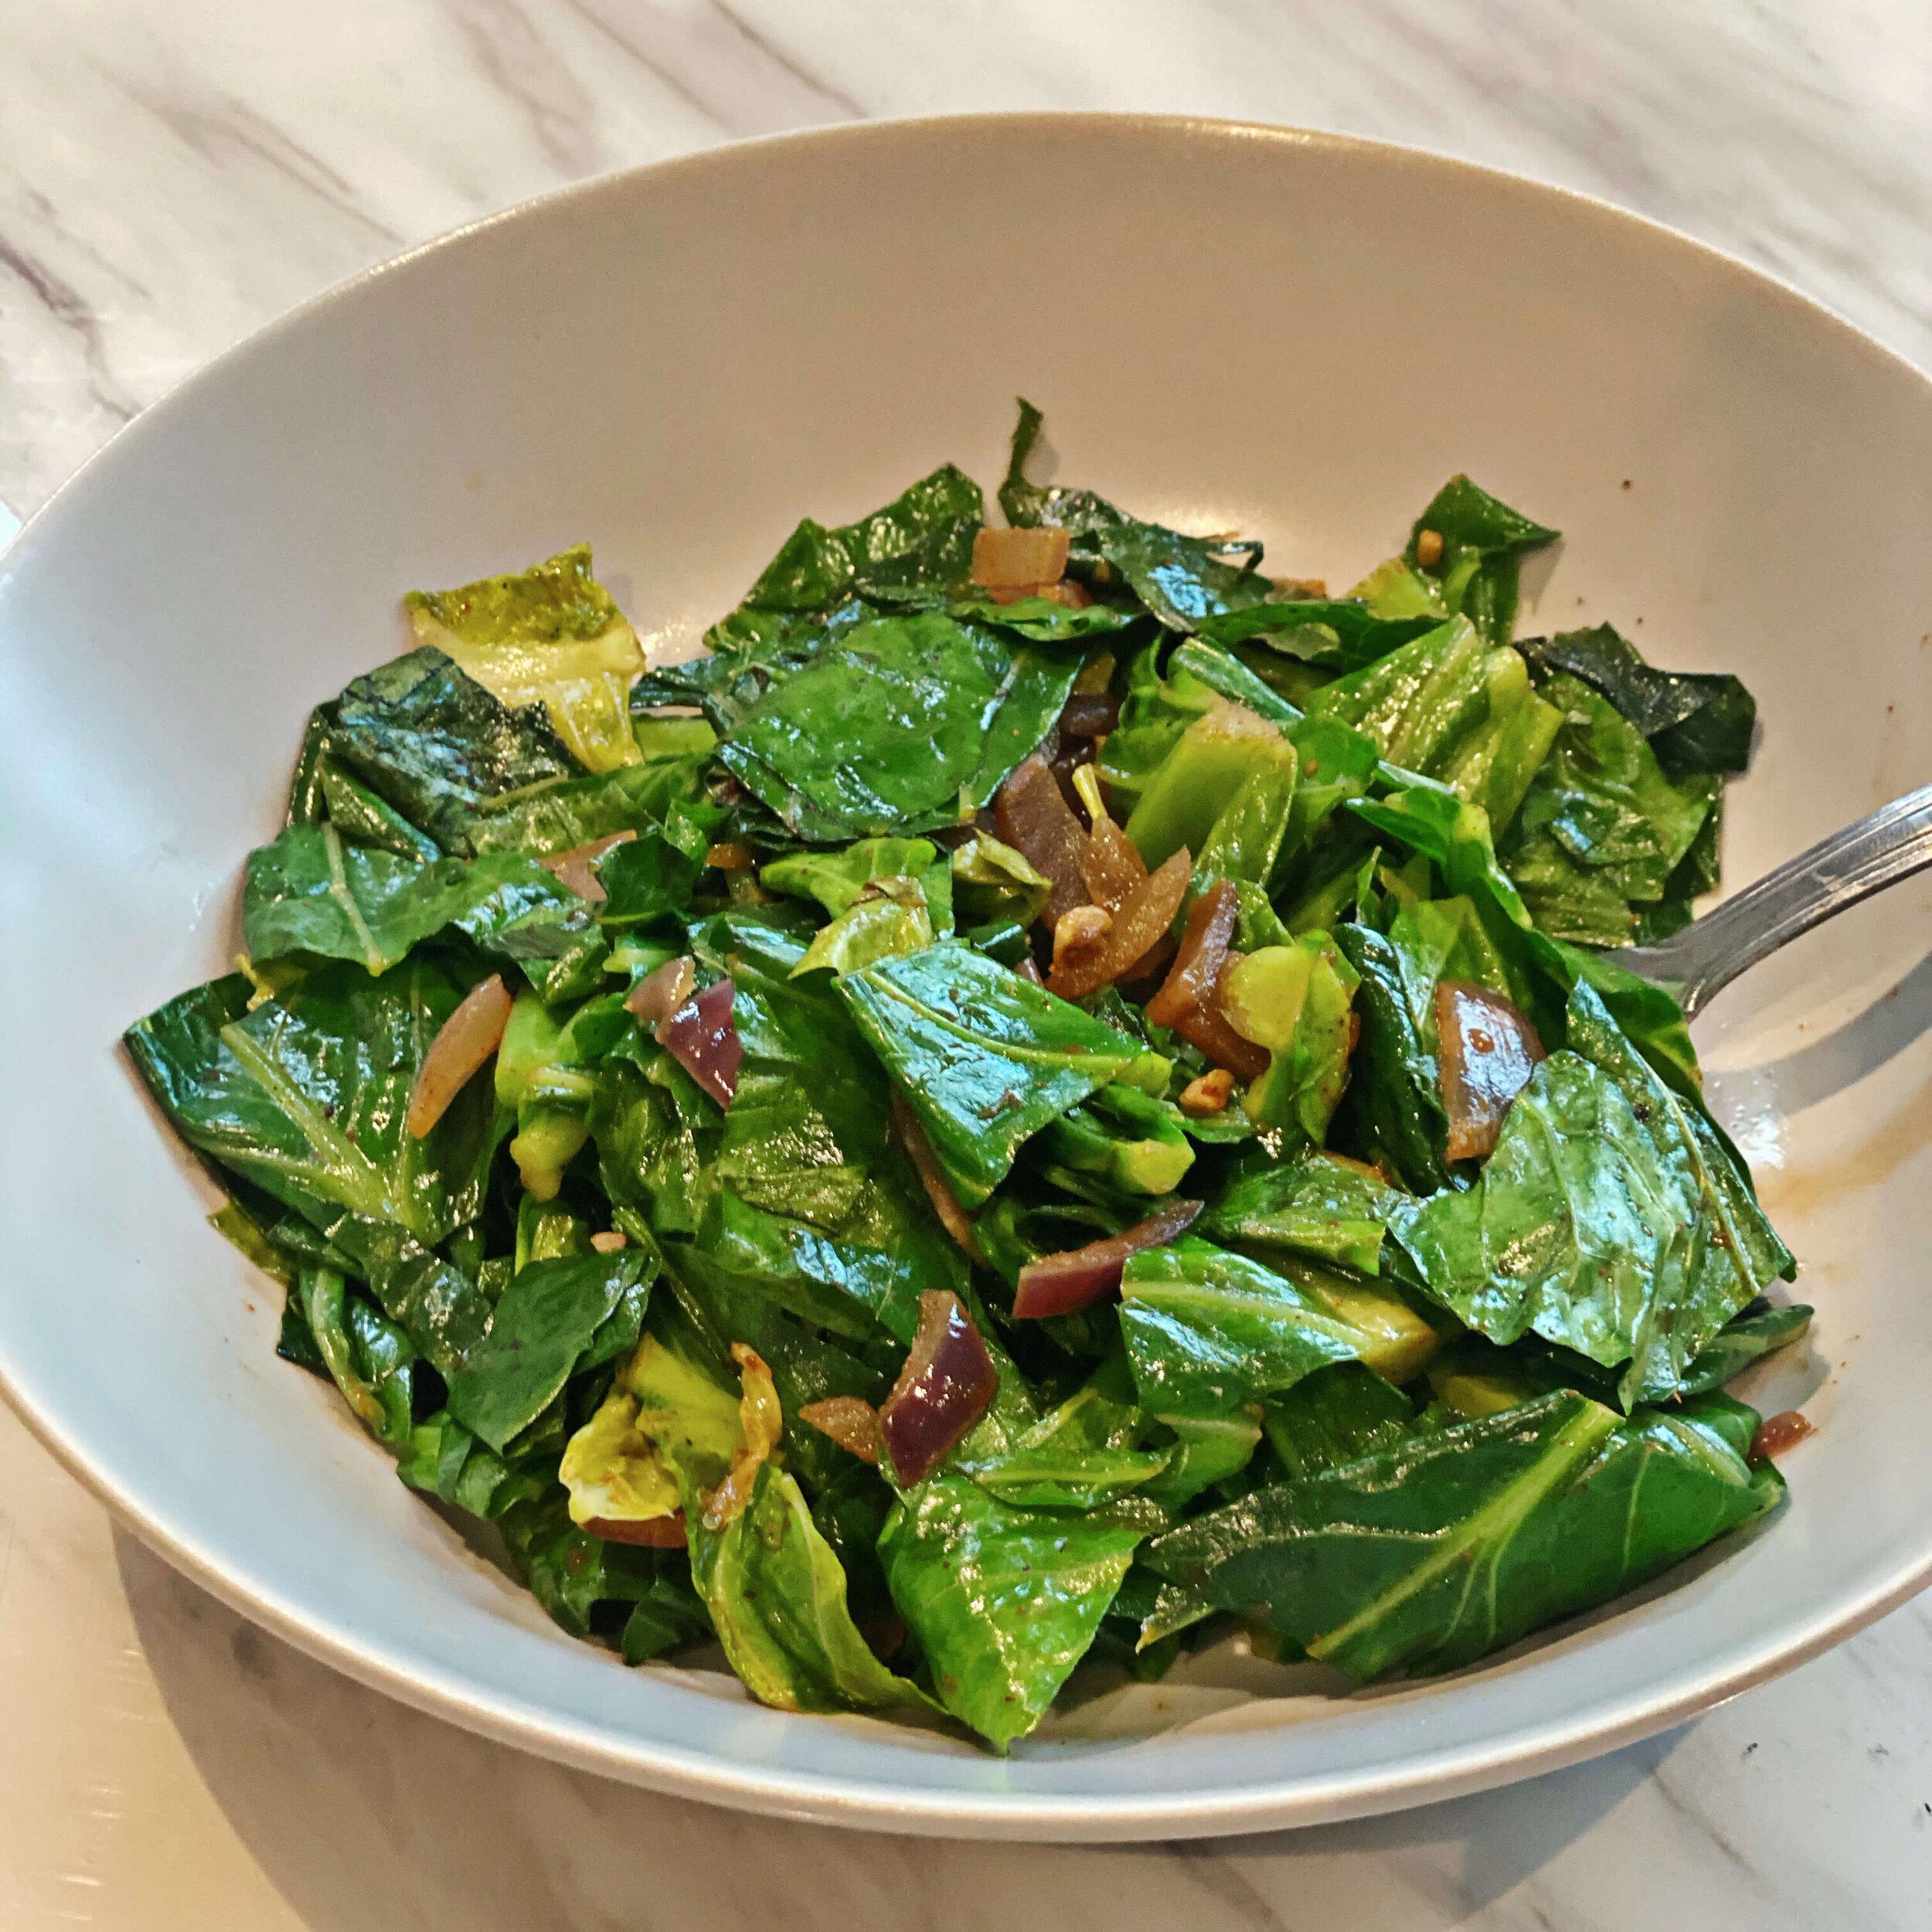 Stir-Fried Chilli and Garlic Greens